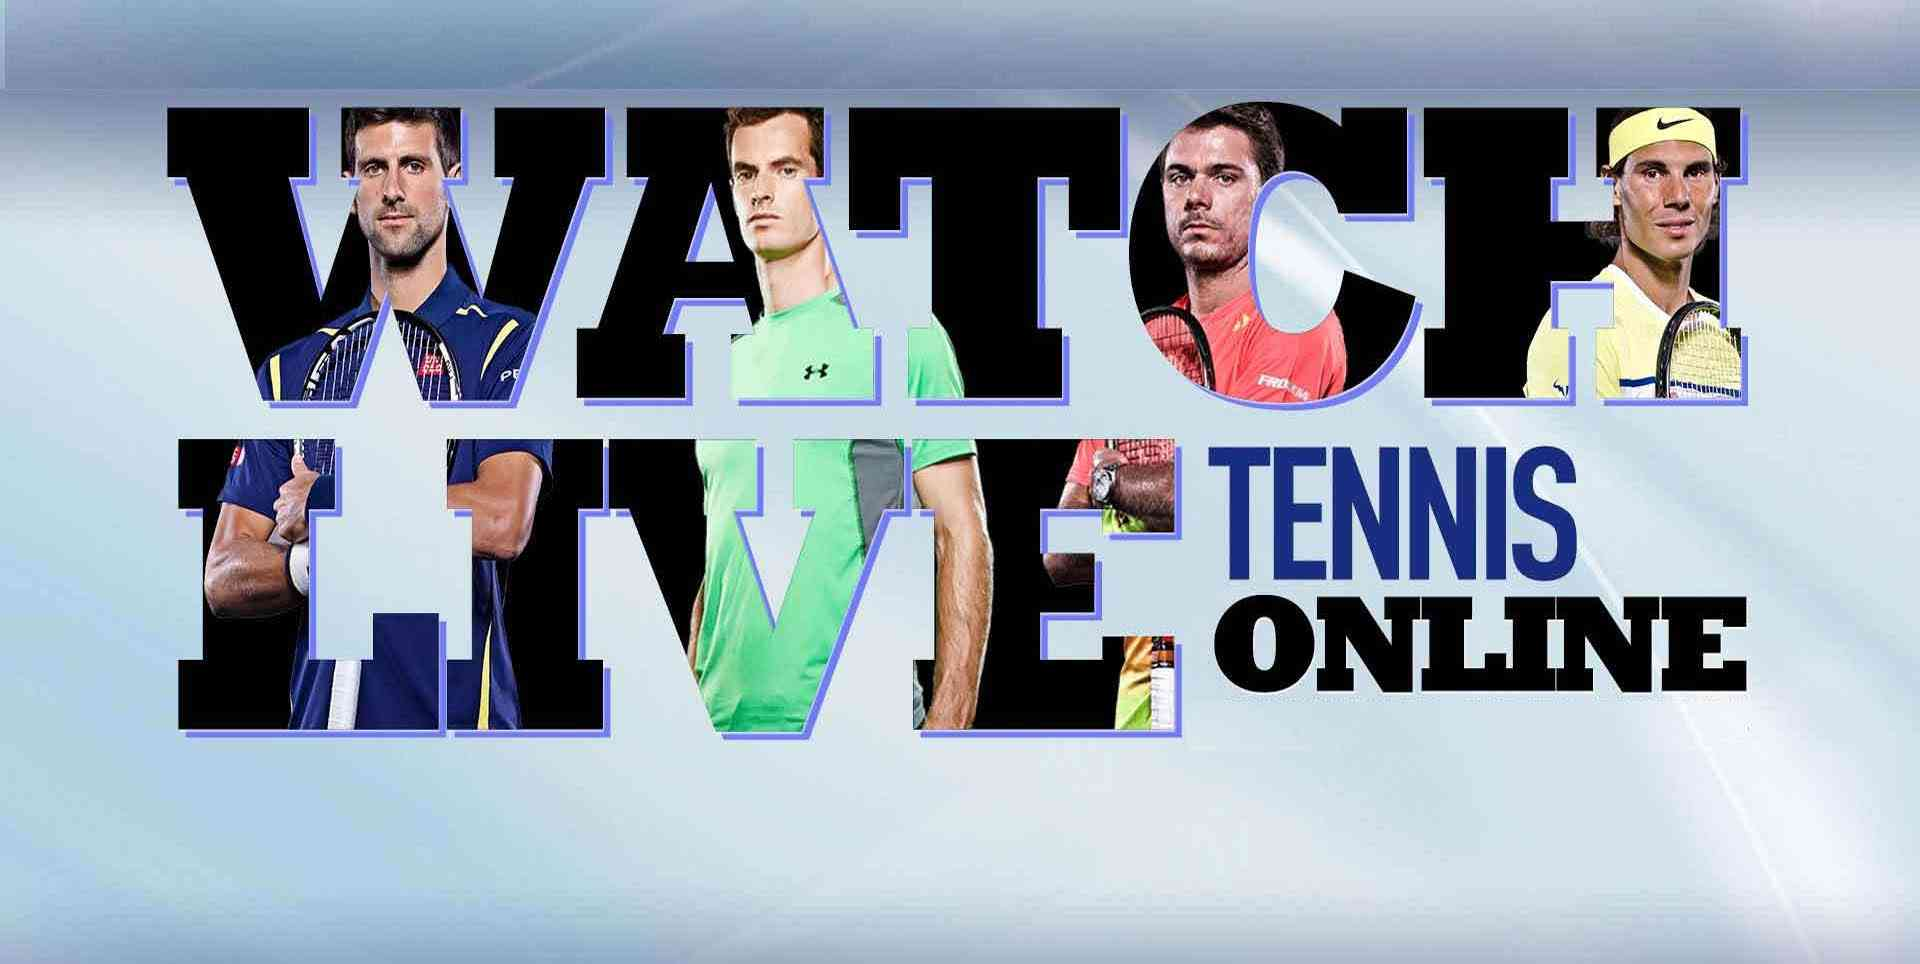 Watch 1st Round K. Nishikori vs K. De Schepper Online